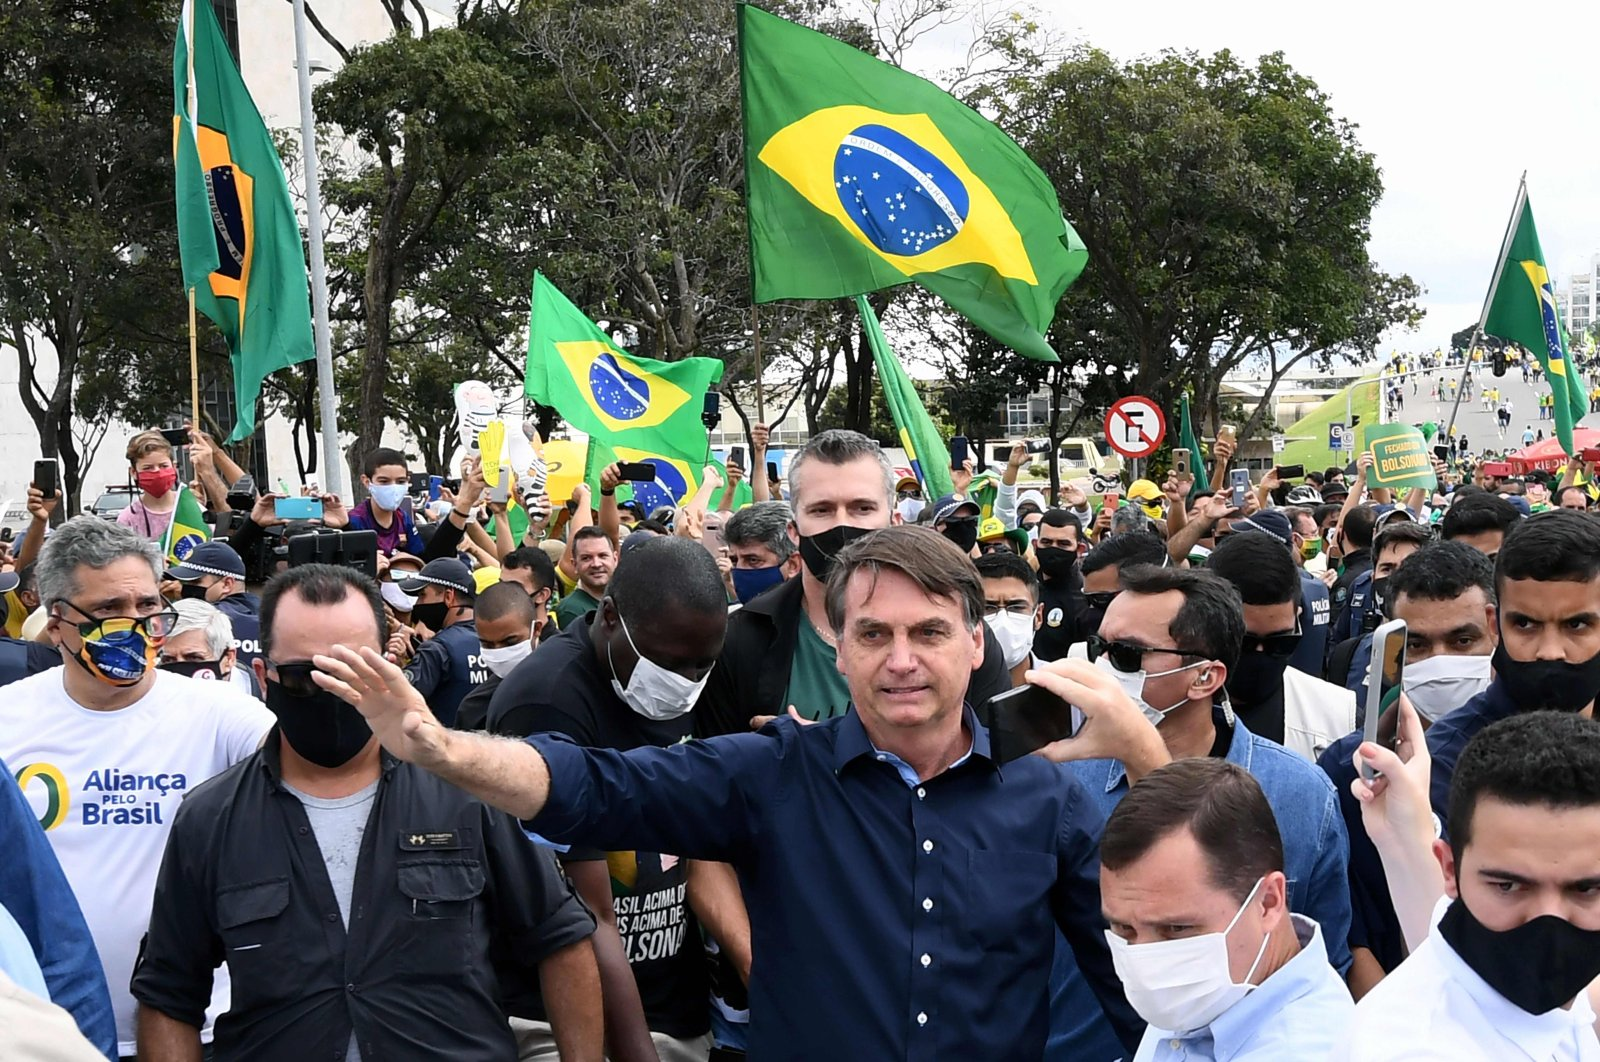 Brazil's President Jair Bolsonaro greets supporters upon arrival at Planalto Palace in Brasilia amid the coronavirus pandemic, May 24, 2020. (AFP Photo)